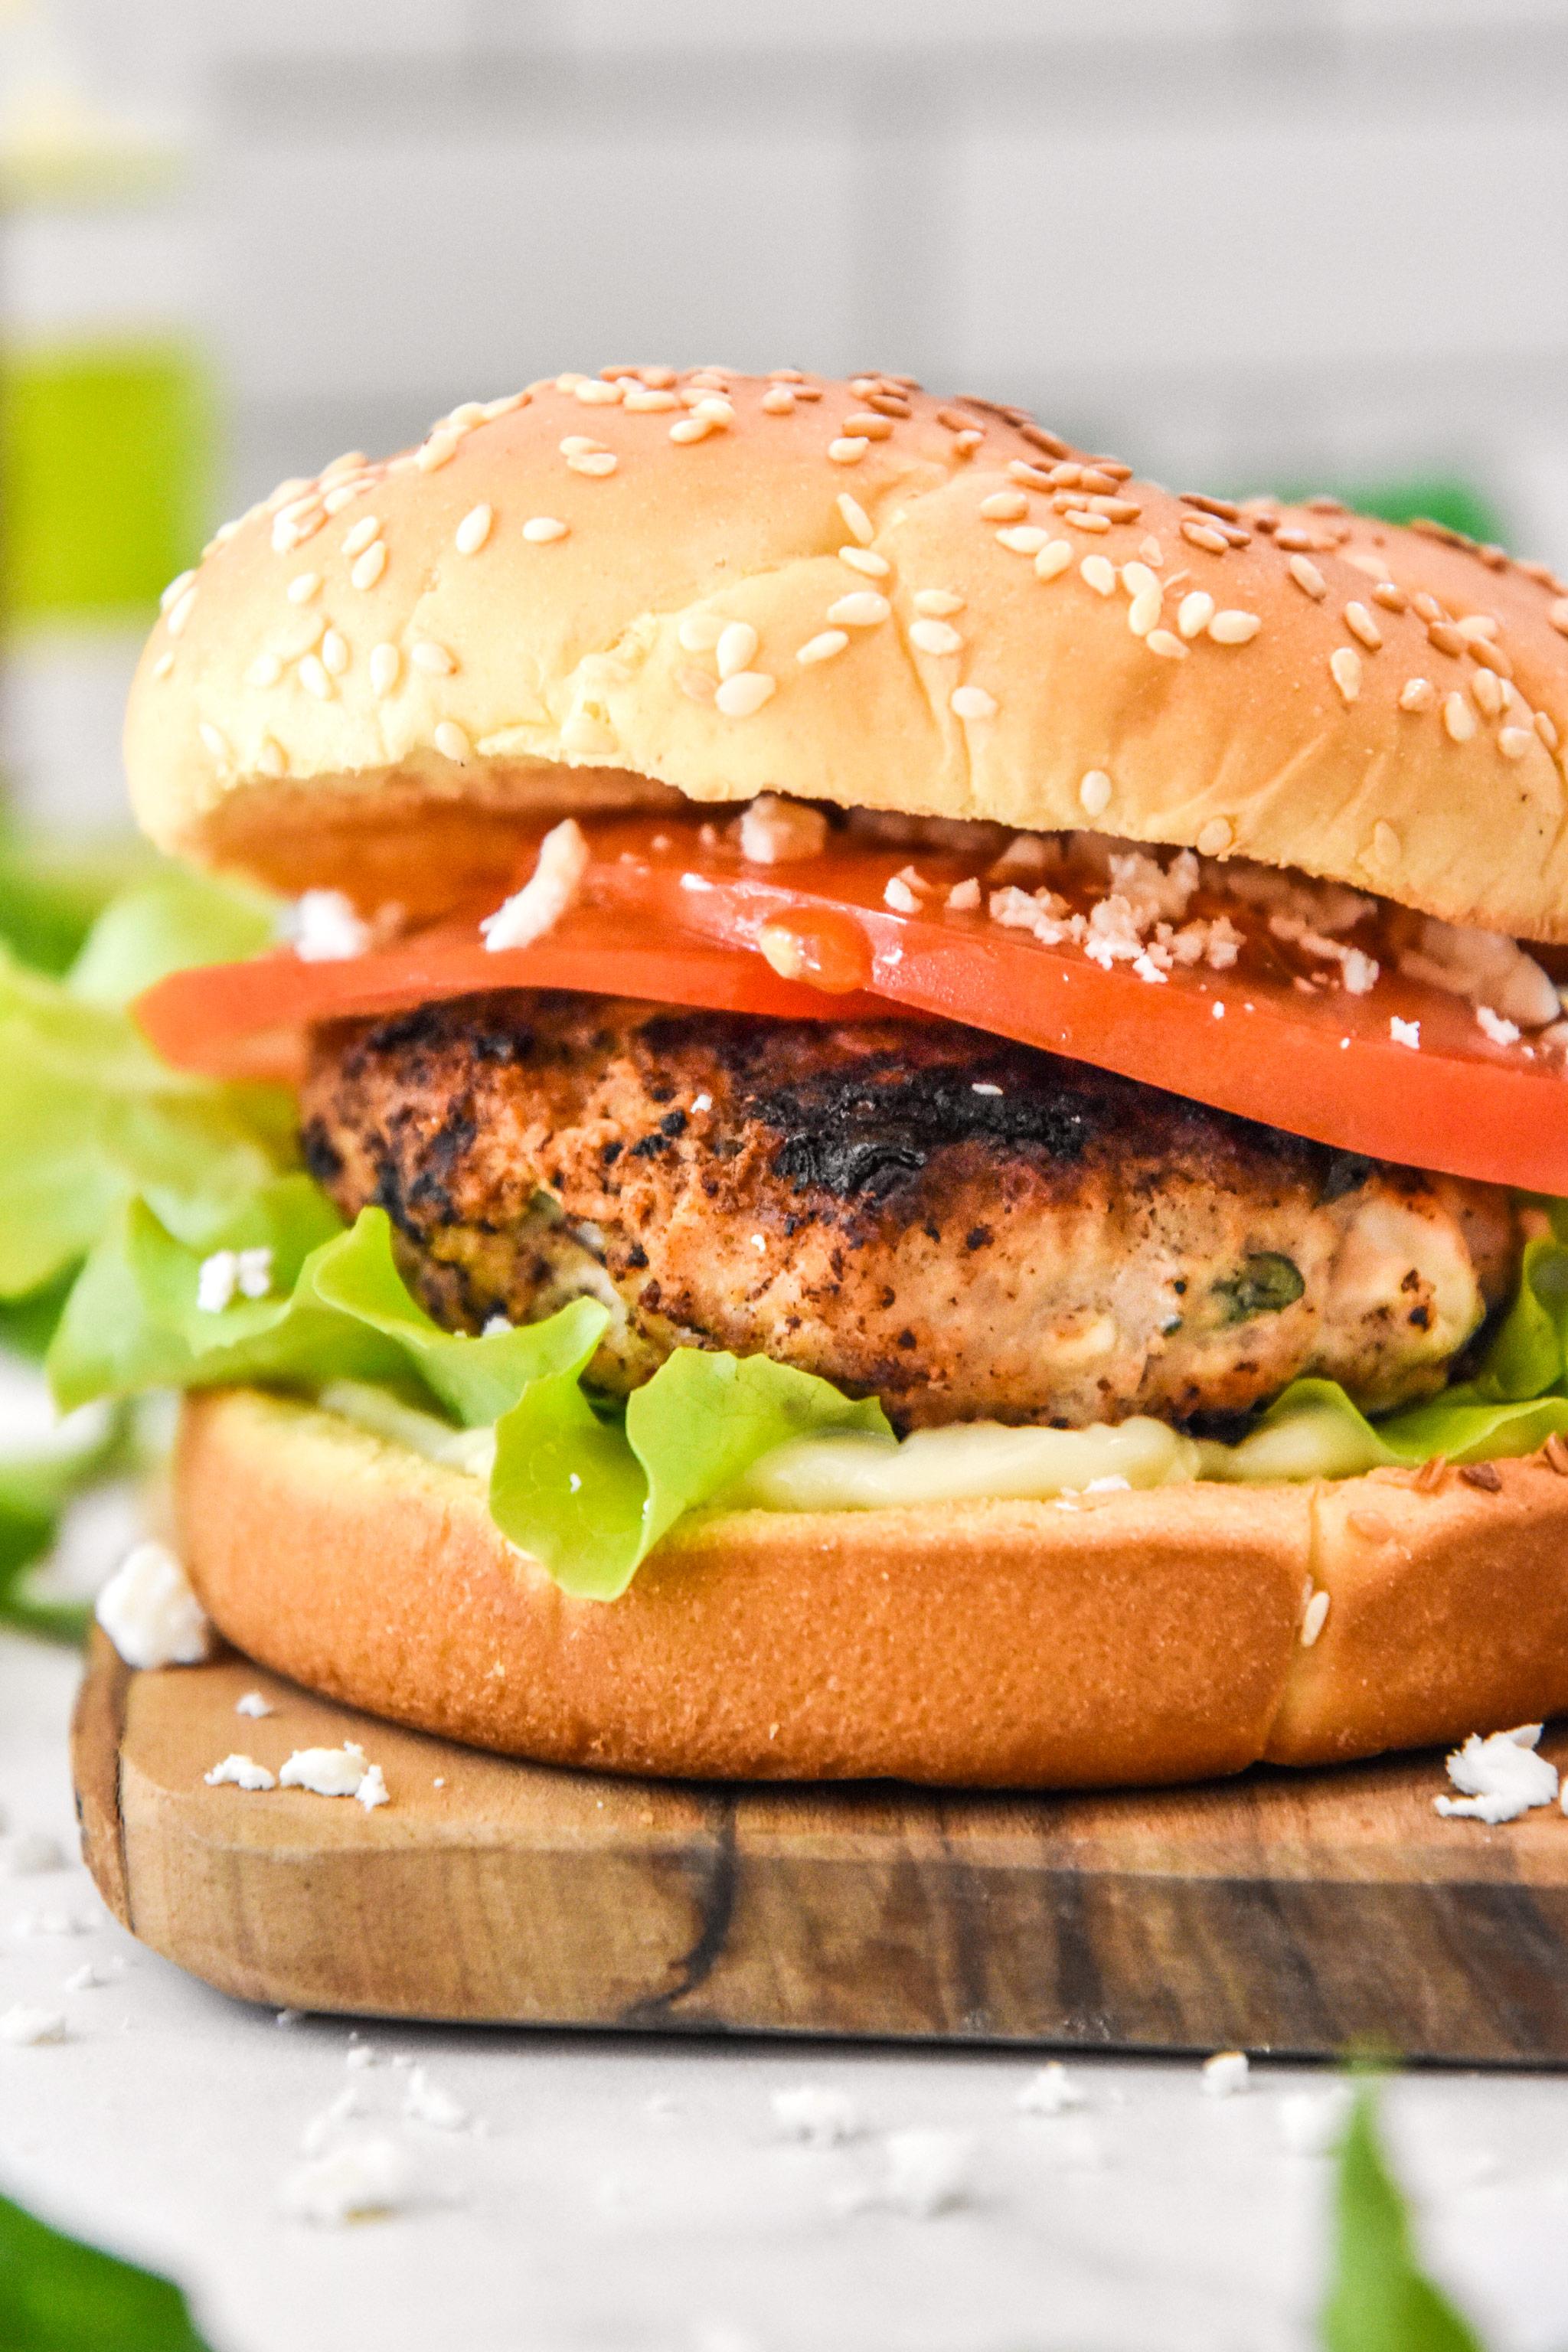 close up of assembled feta basil turkey burger on a bun.